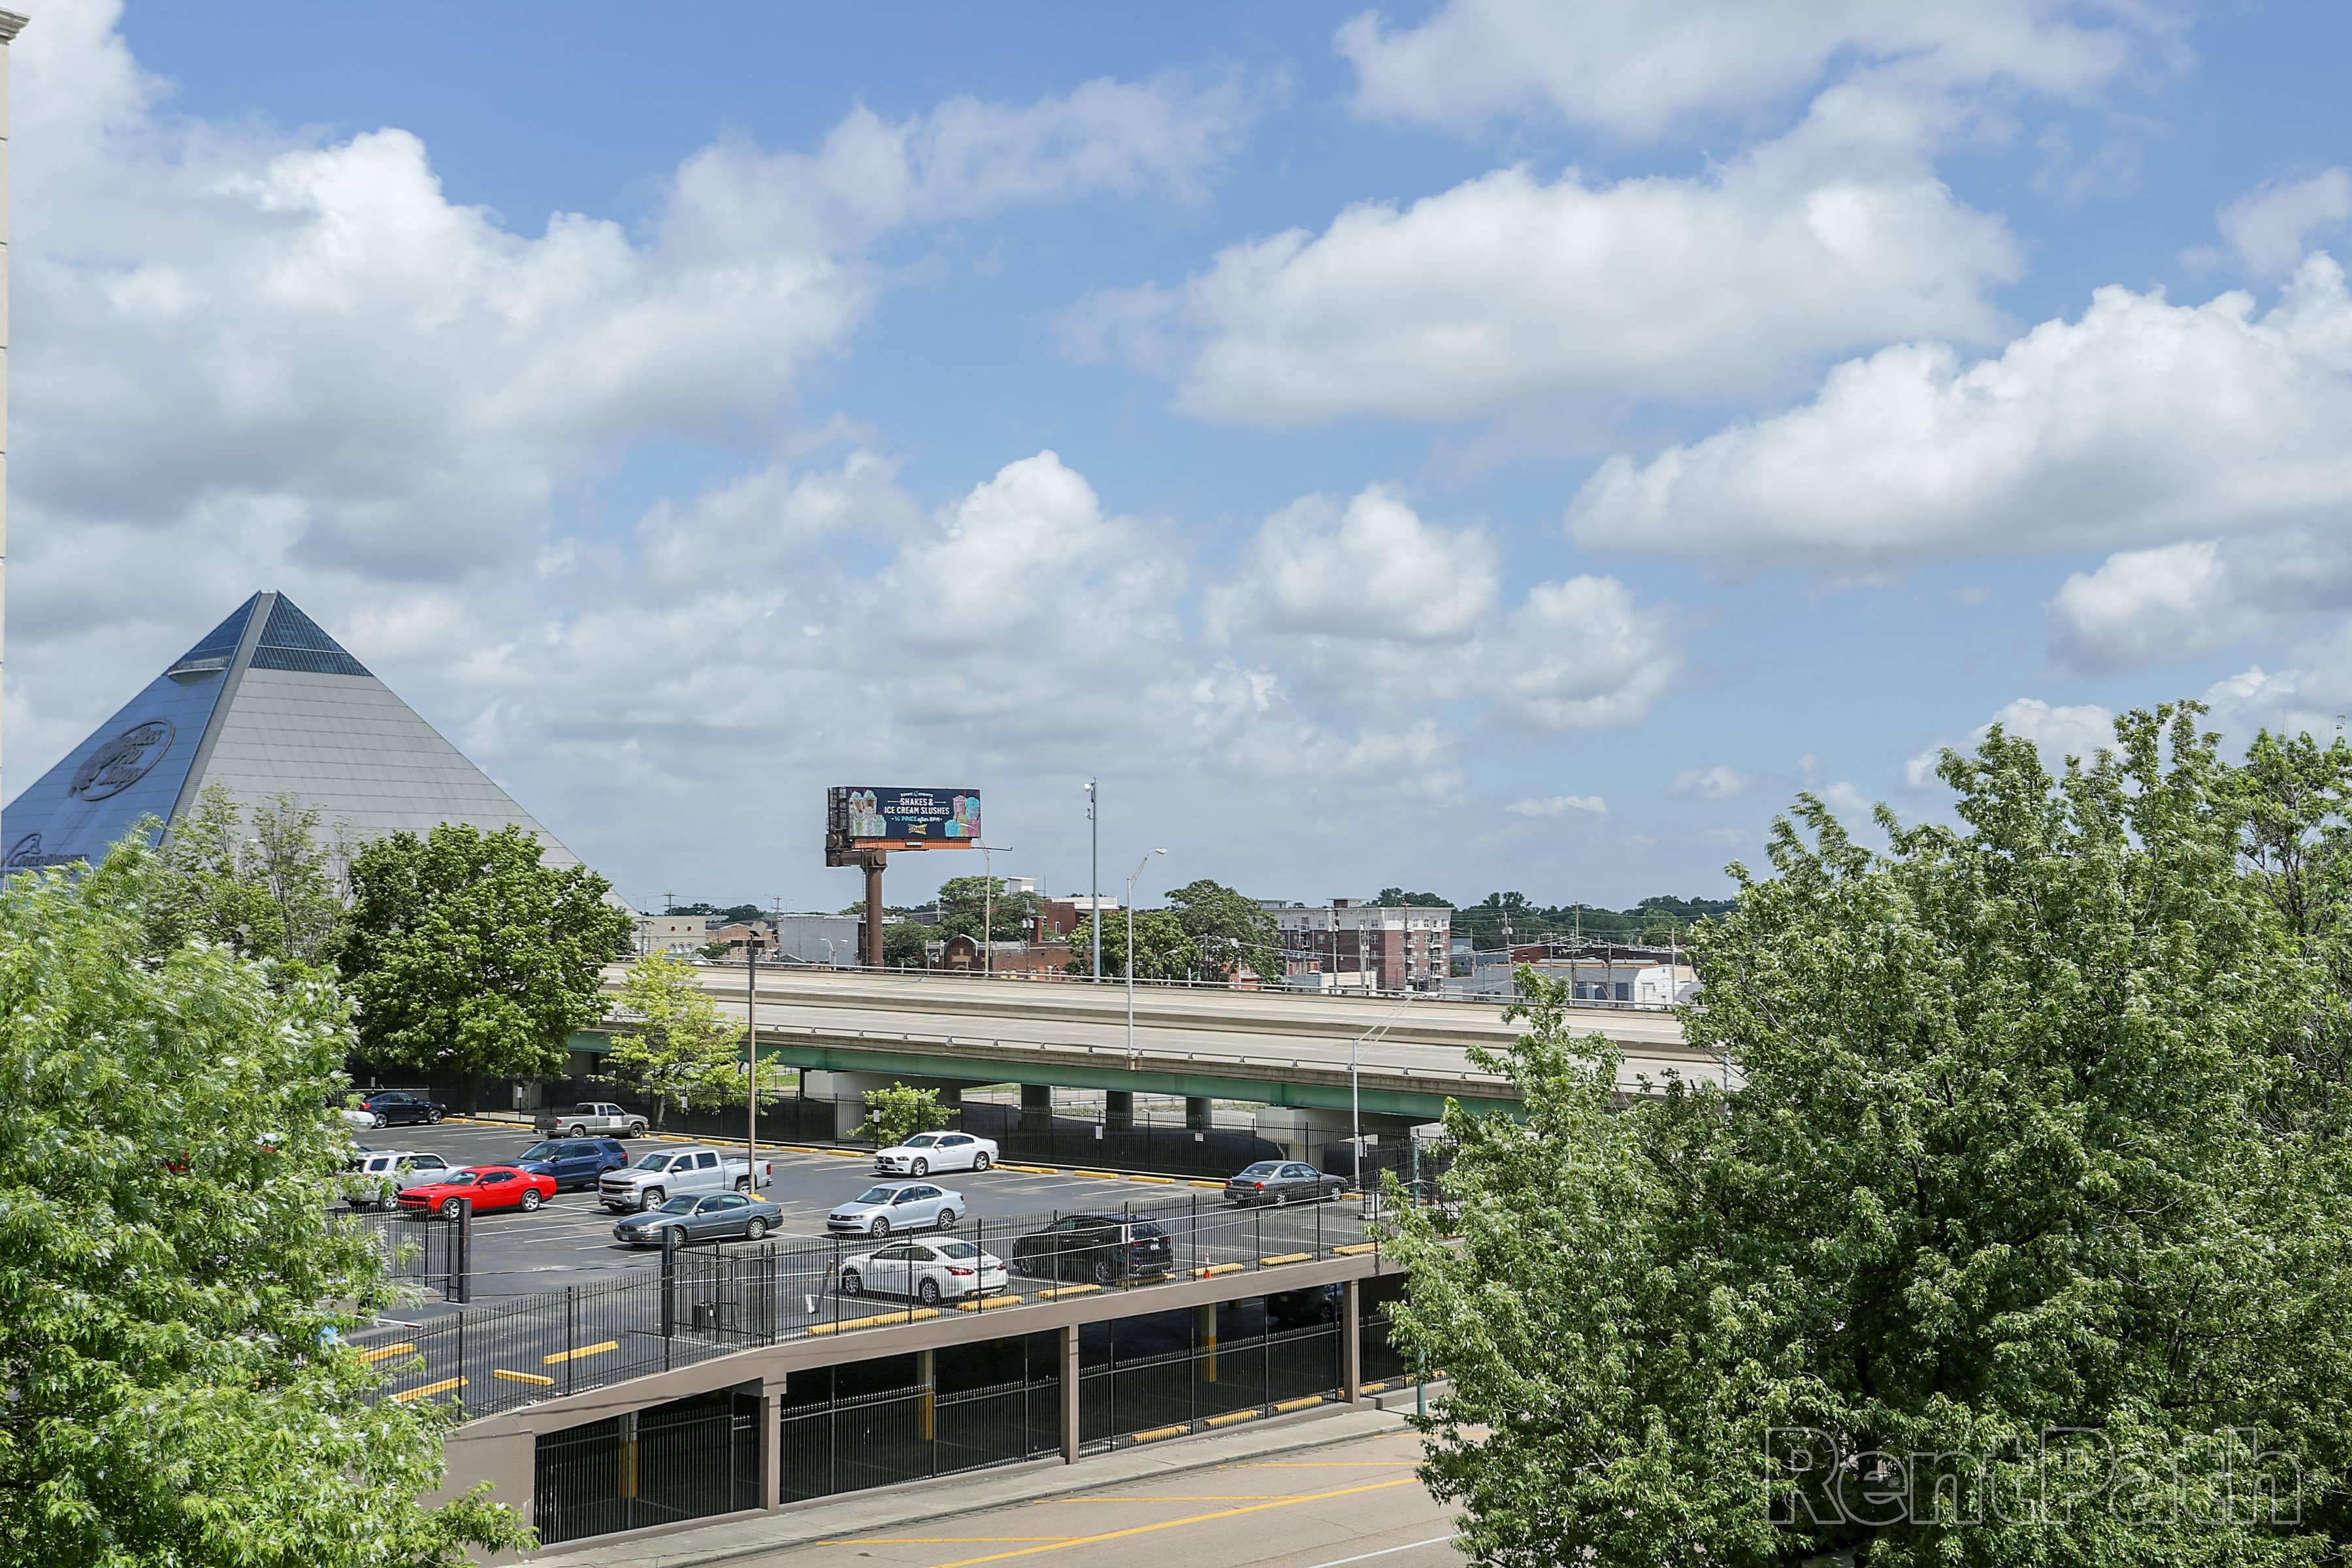 Memphis photogallery 15